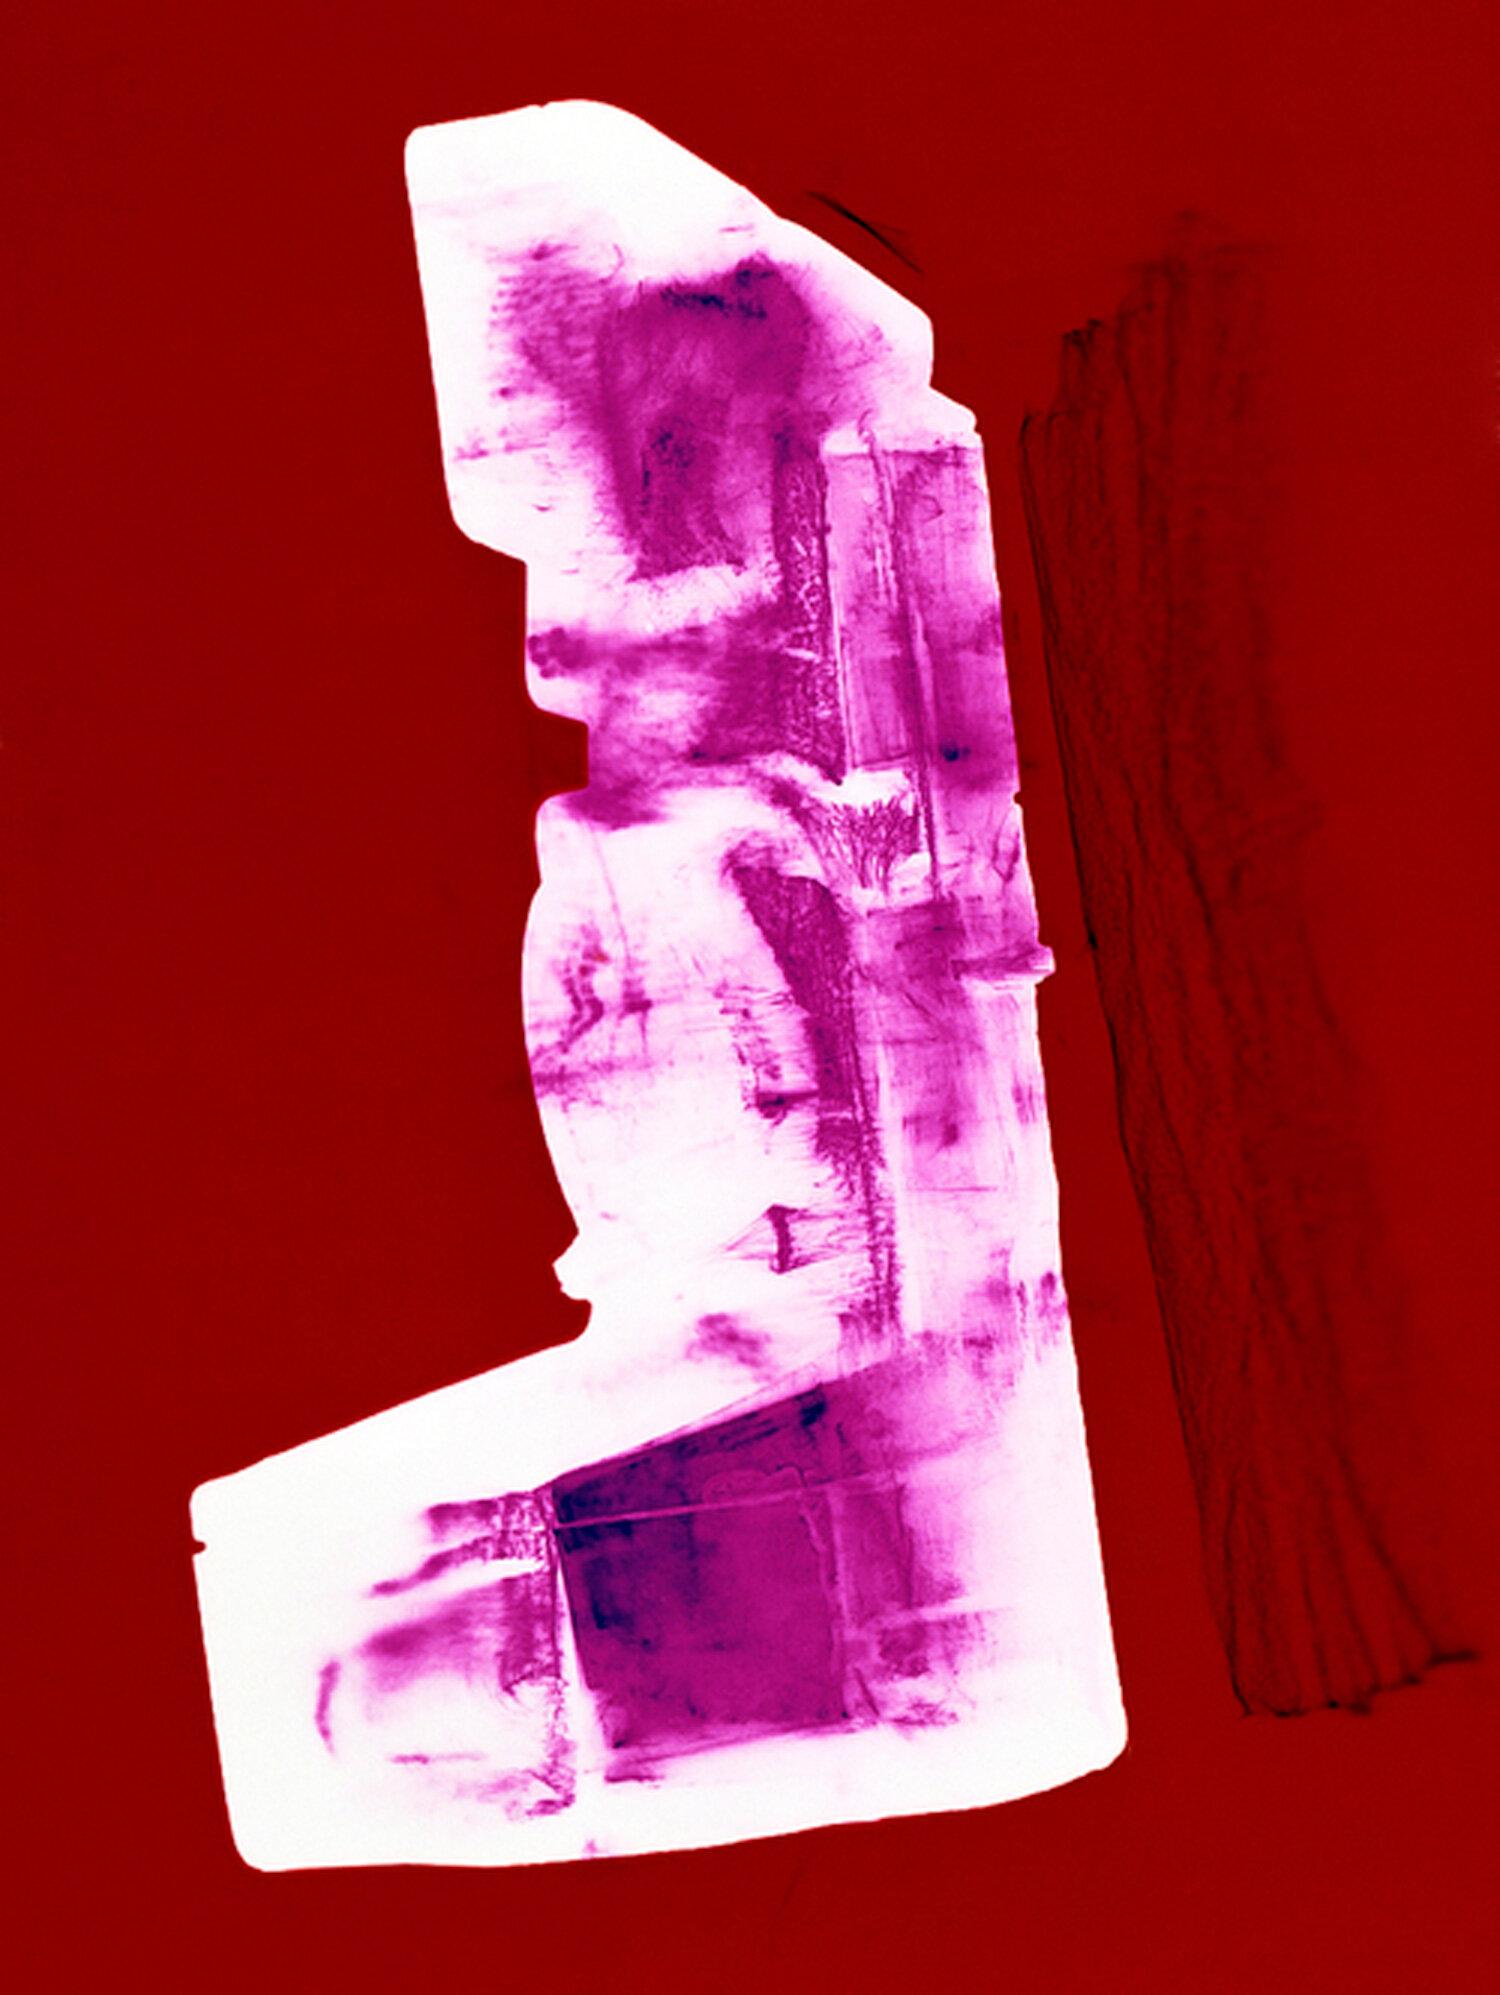 1000 onestep (pink), Penelope Davis, 2003, type c print, 125x94cm